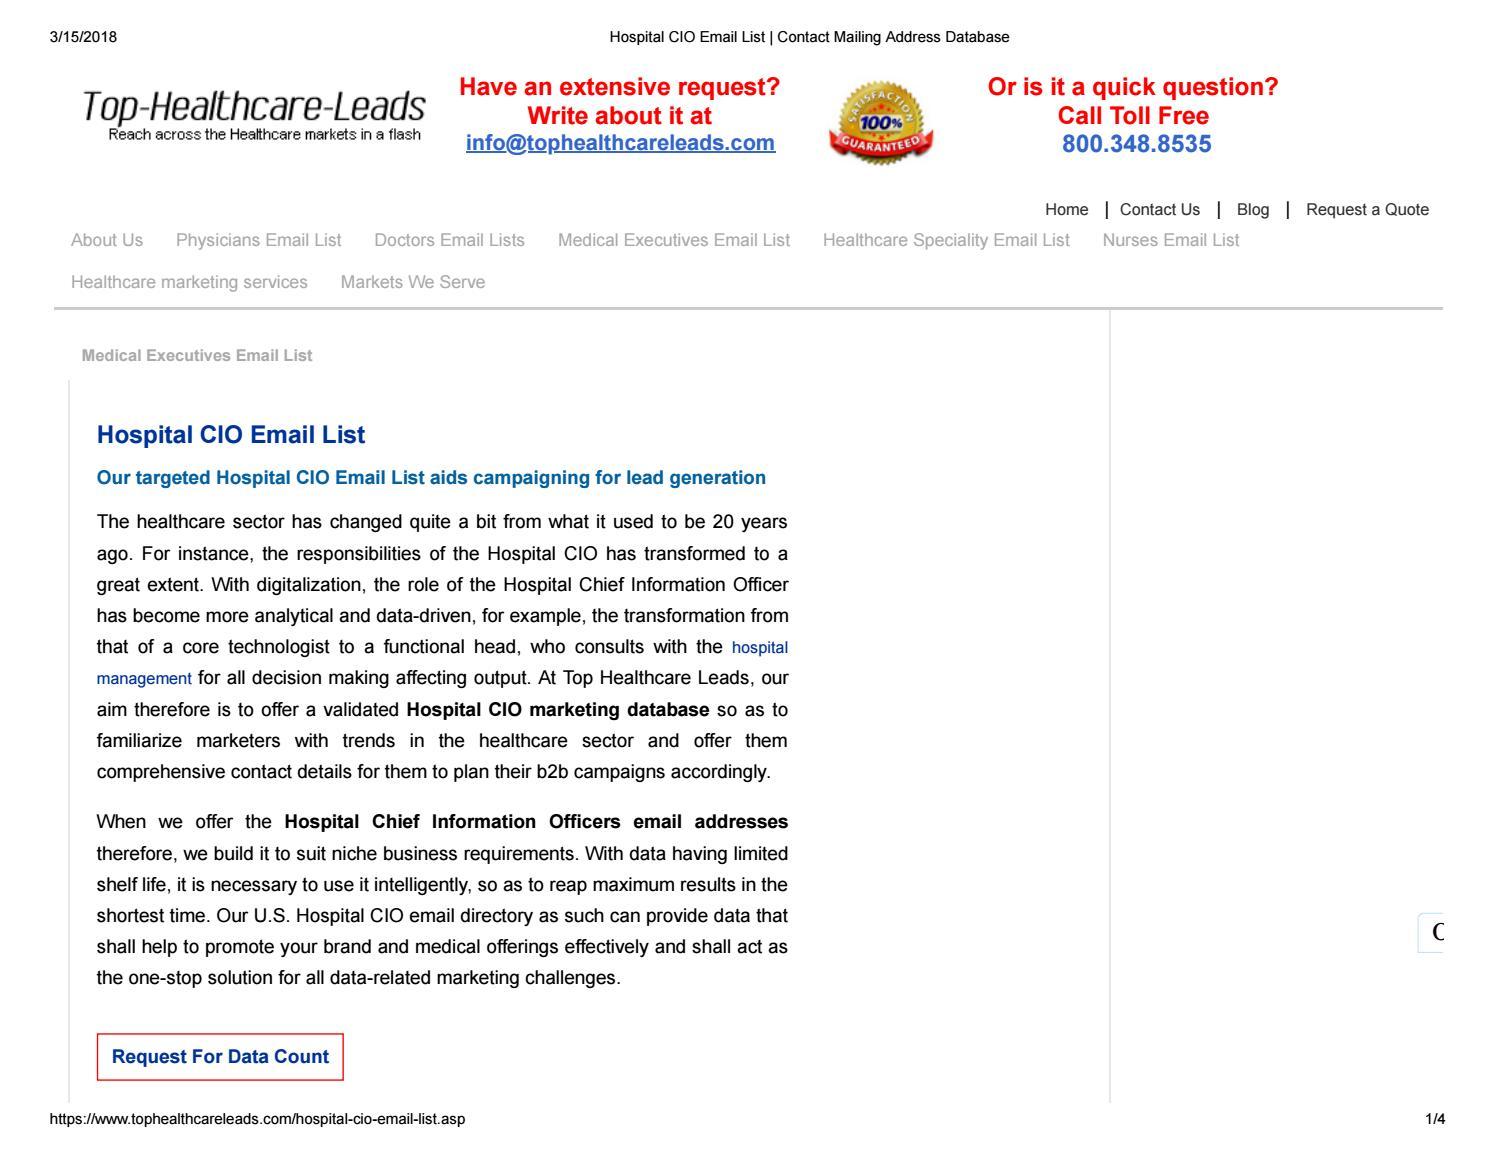 Hospital CIO Directory - Top Healthcare Leads by